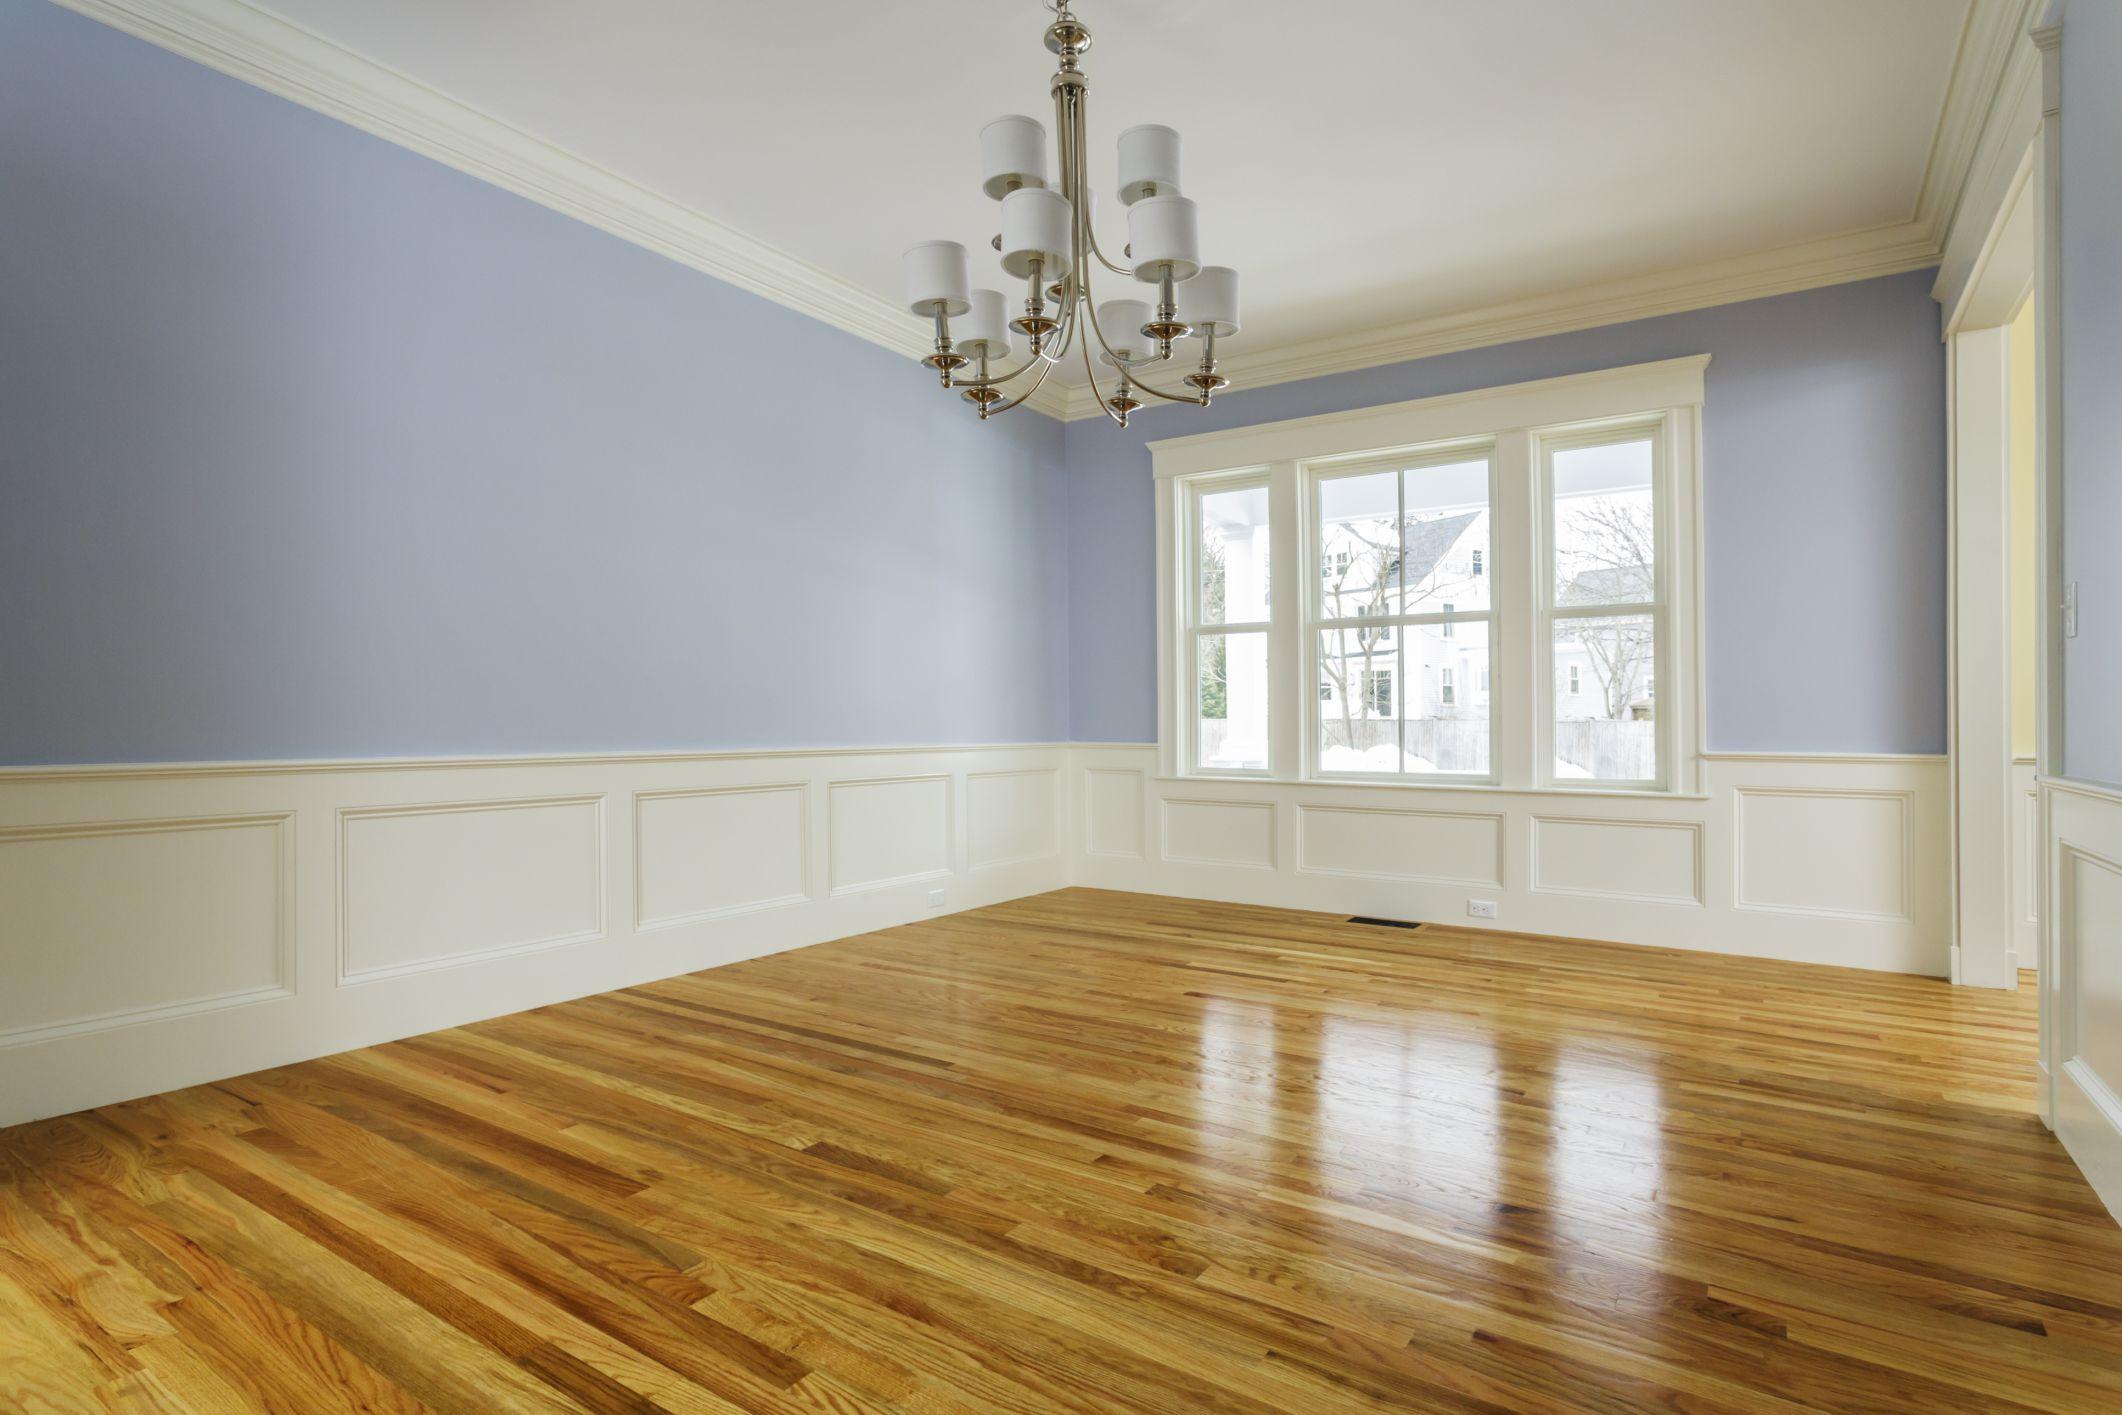 cost per foot to refinish hardwood floors of the cost to refinish hardwood floors for 168686572 highres 56a2fd773df78cf7727b6cb3